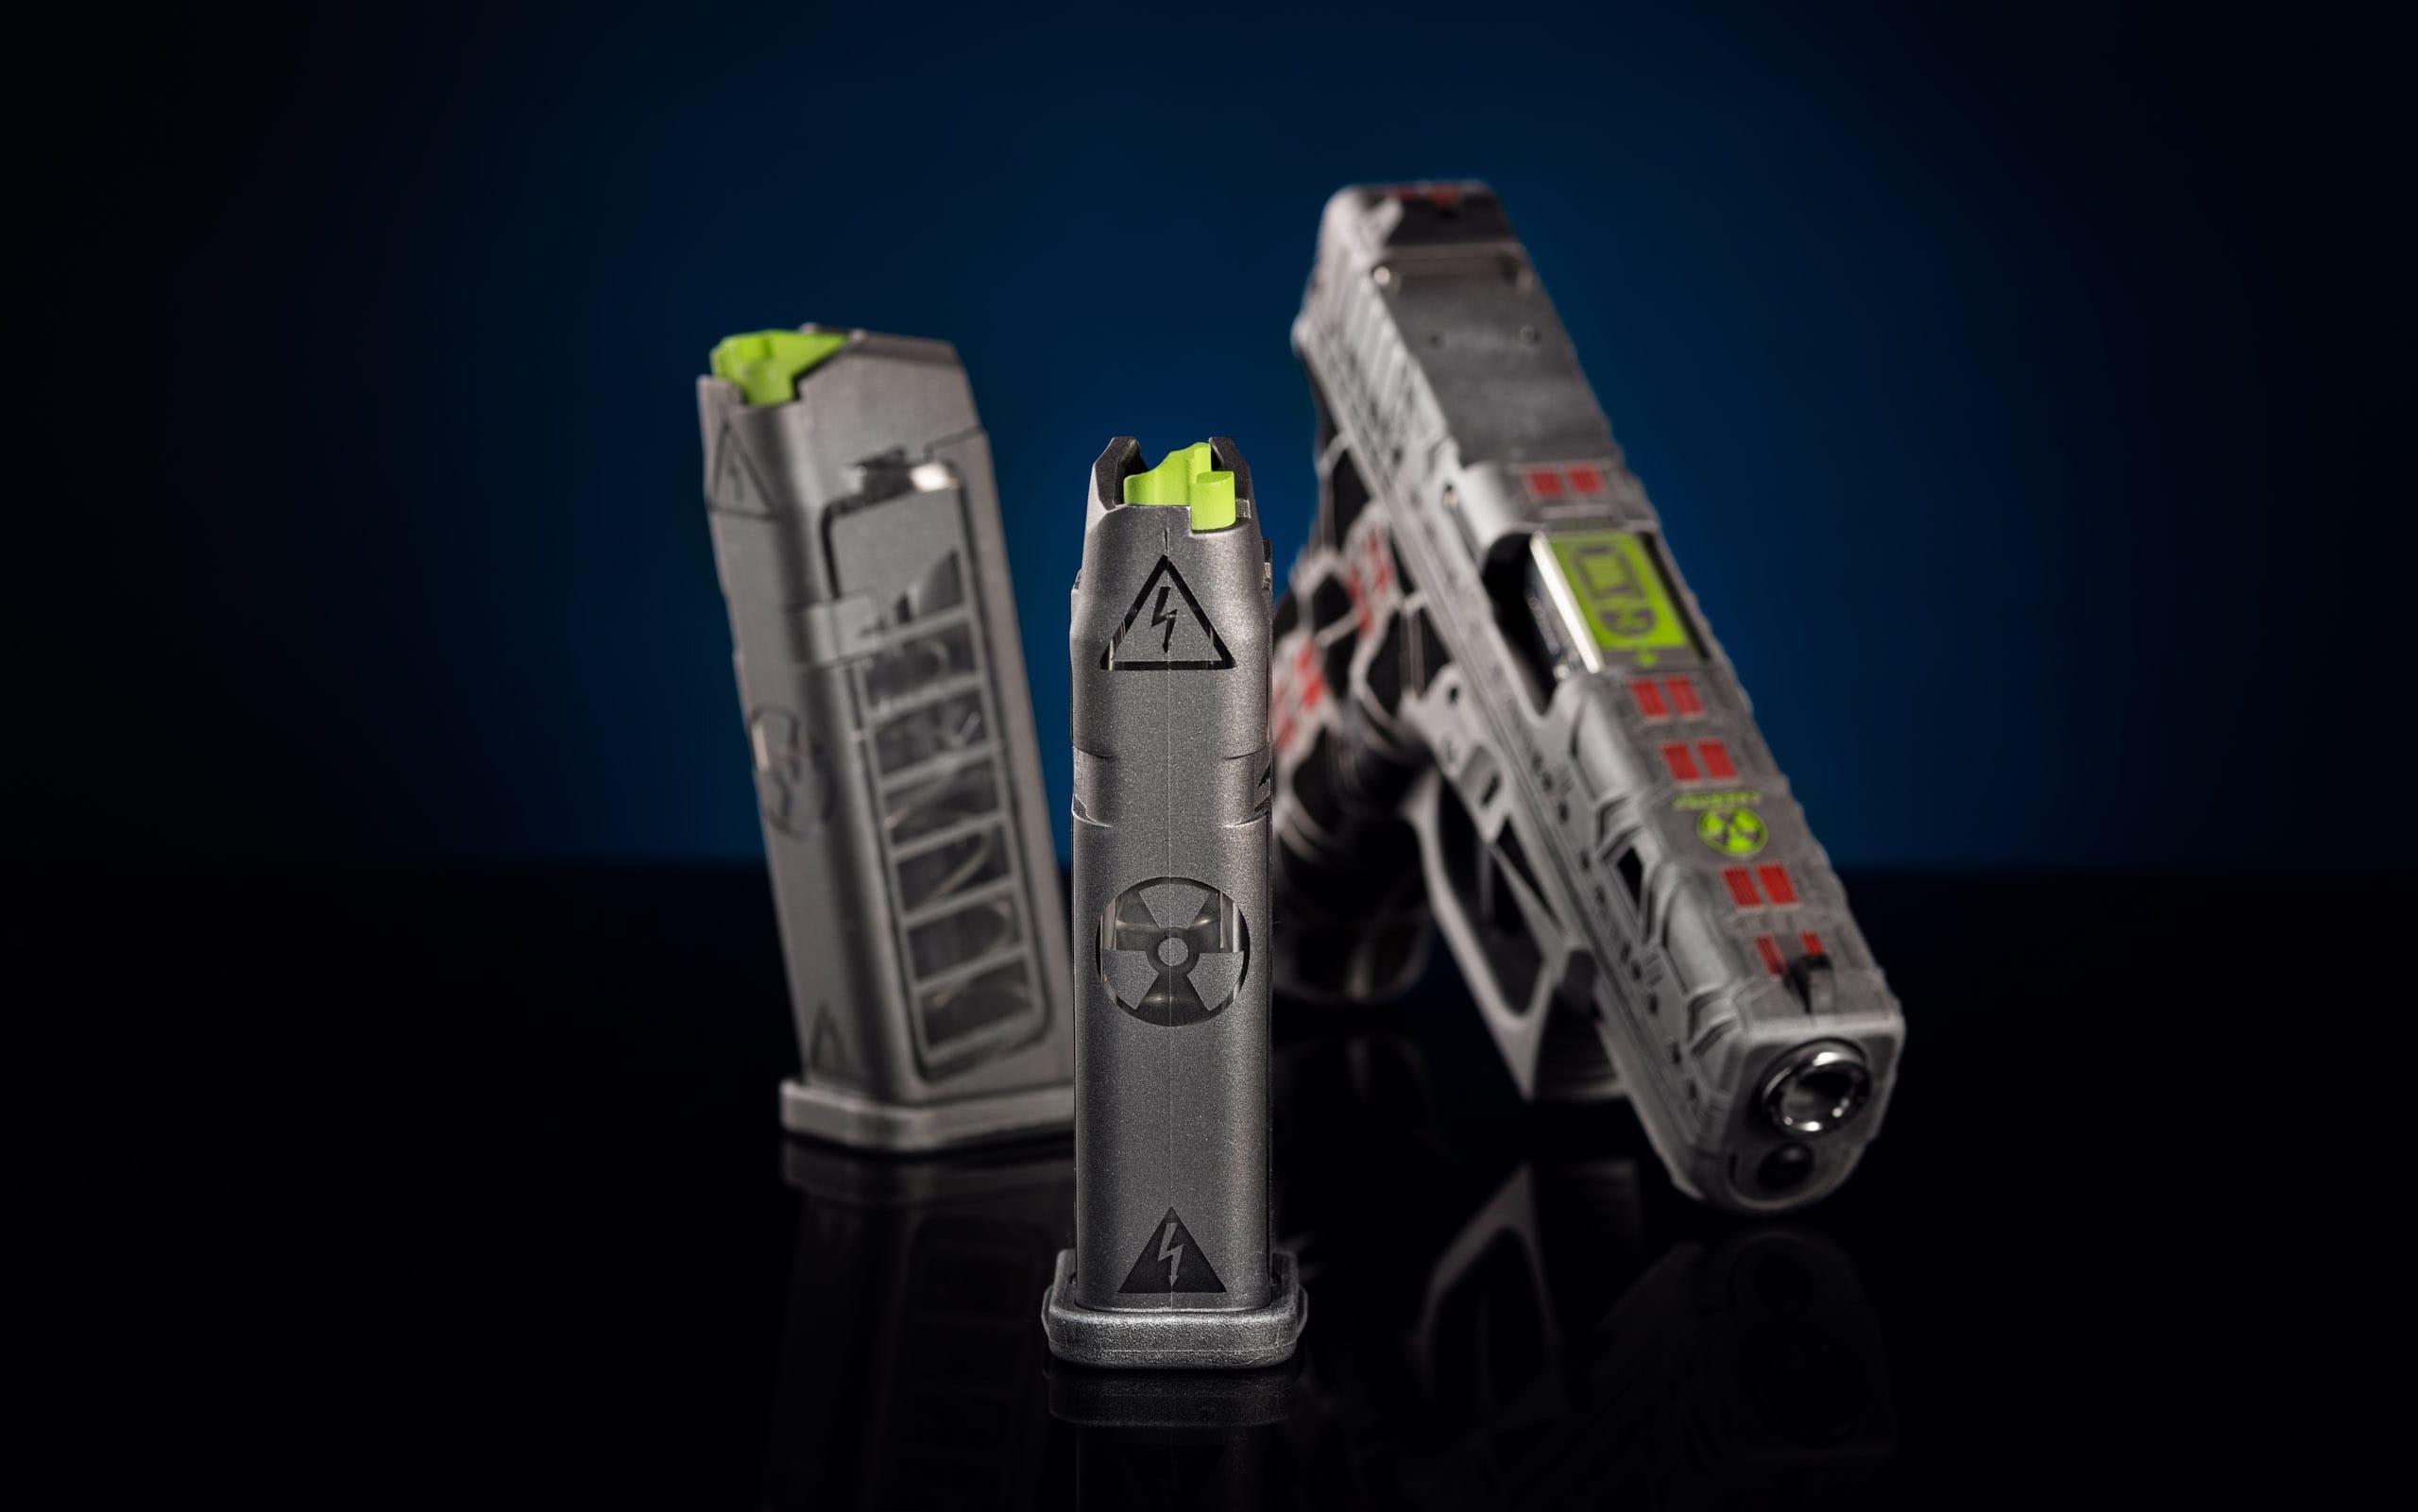 Glock Tuning Schlitten fräsen rotpunktaufnahme cerakote beschichtung cooles tuning